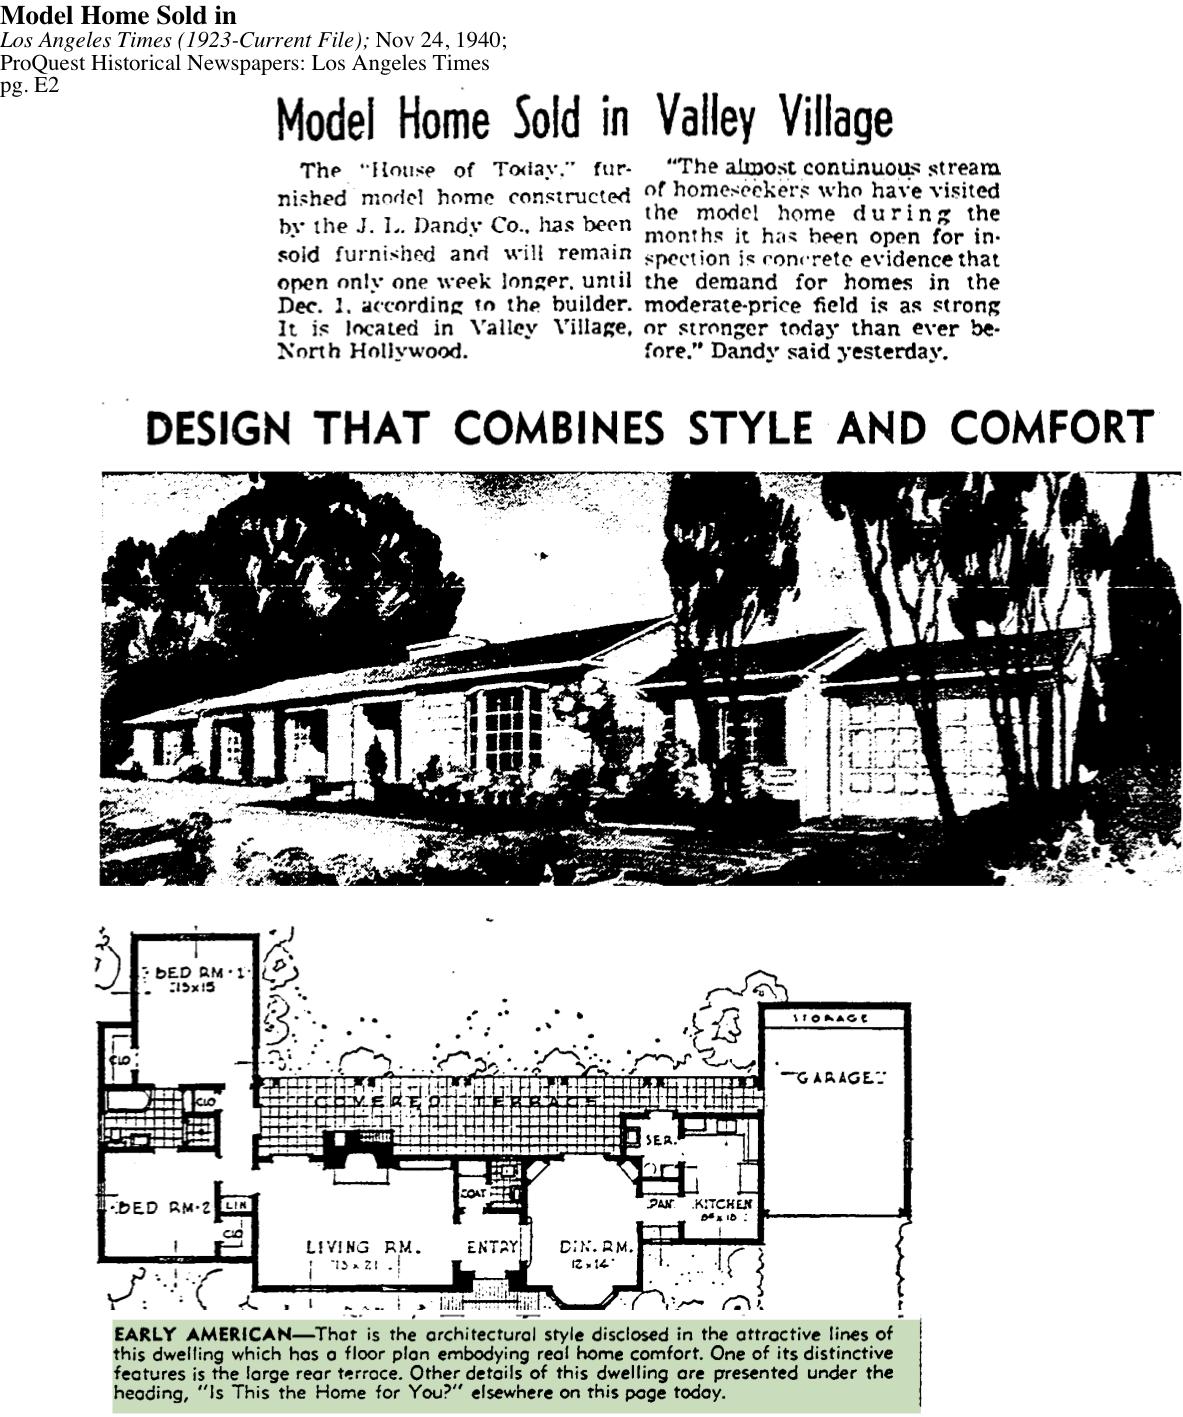 1940-Valley Village Home Sold